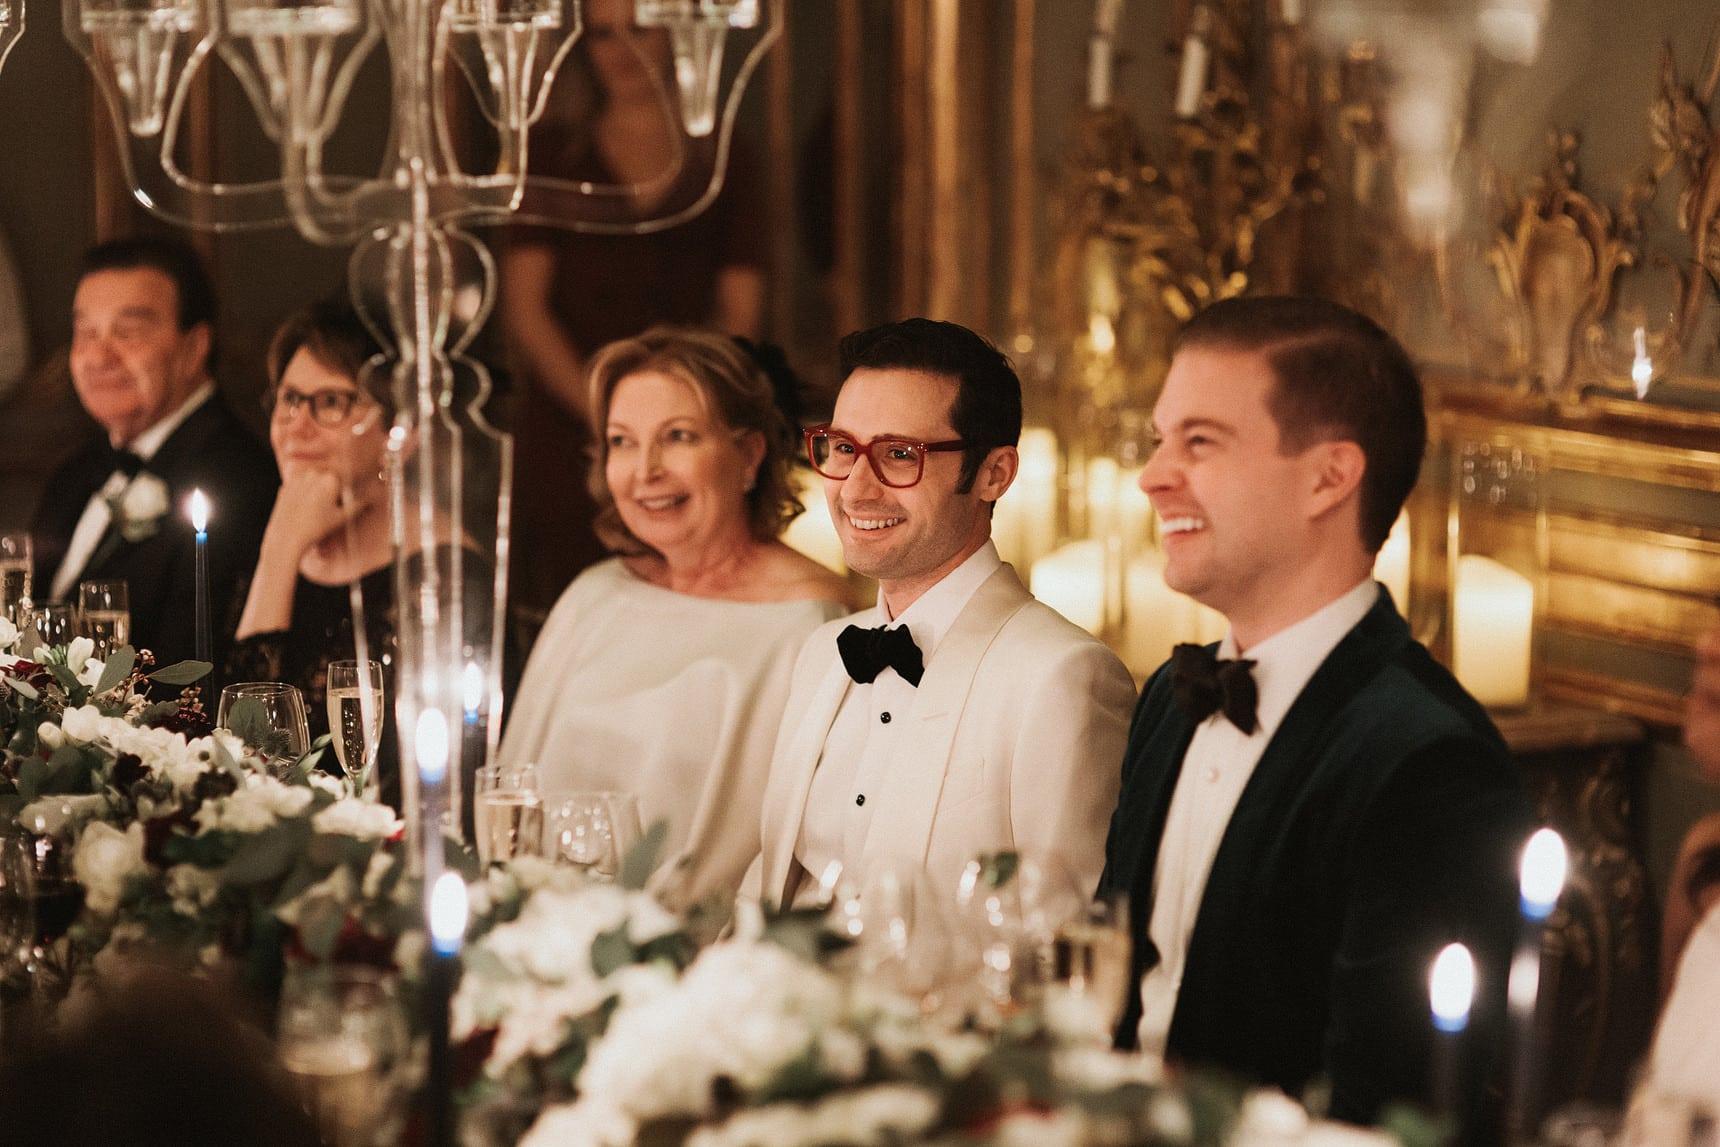 weddings at cliveden house surrey